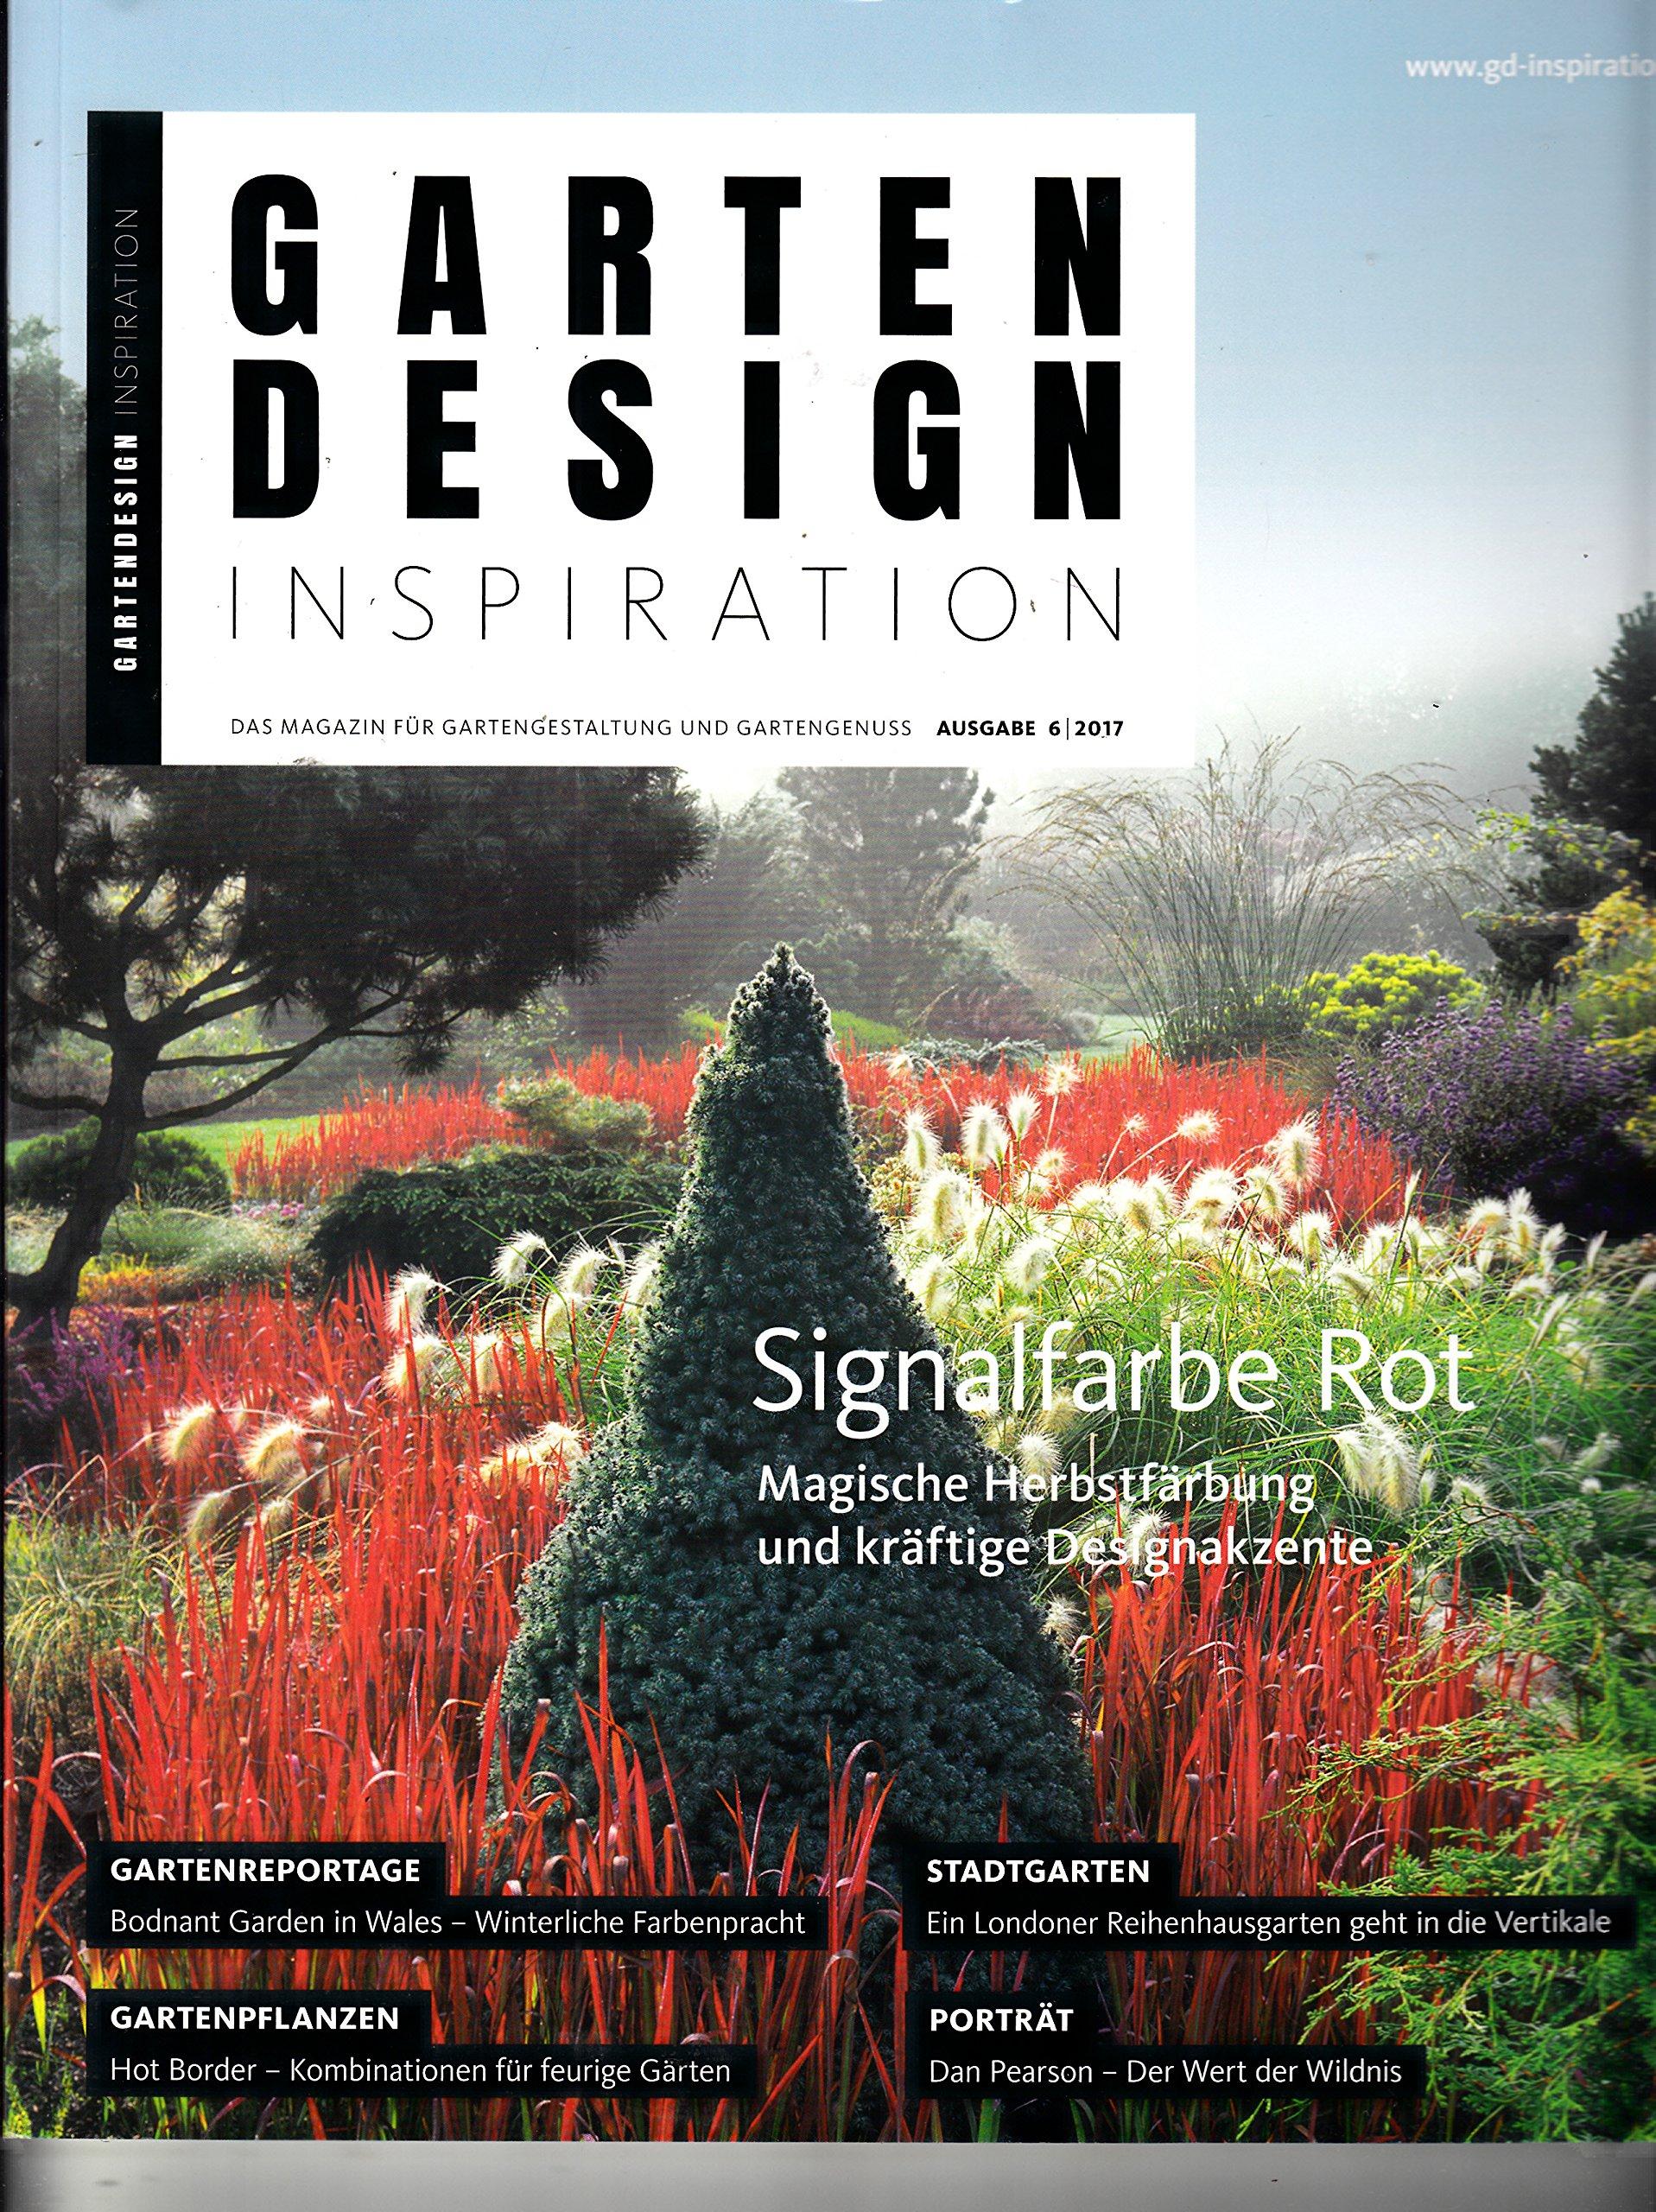 Gartendesign Inspiration 6 2017 Signalfarbe Rot Zeitschrift Magazin